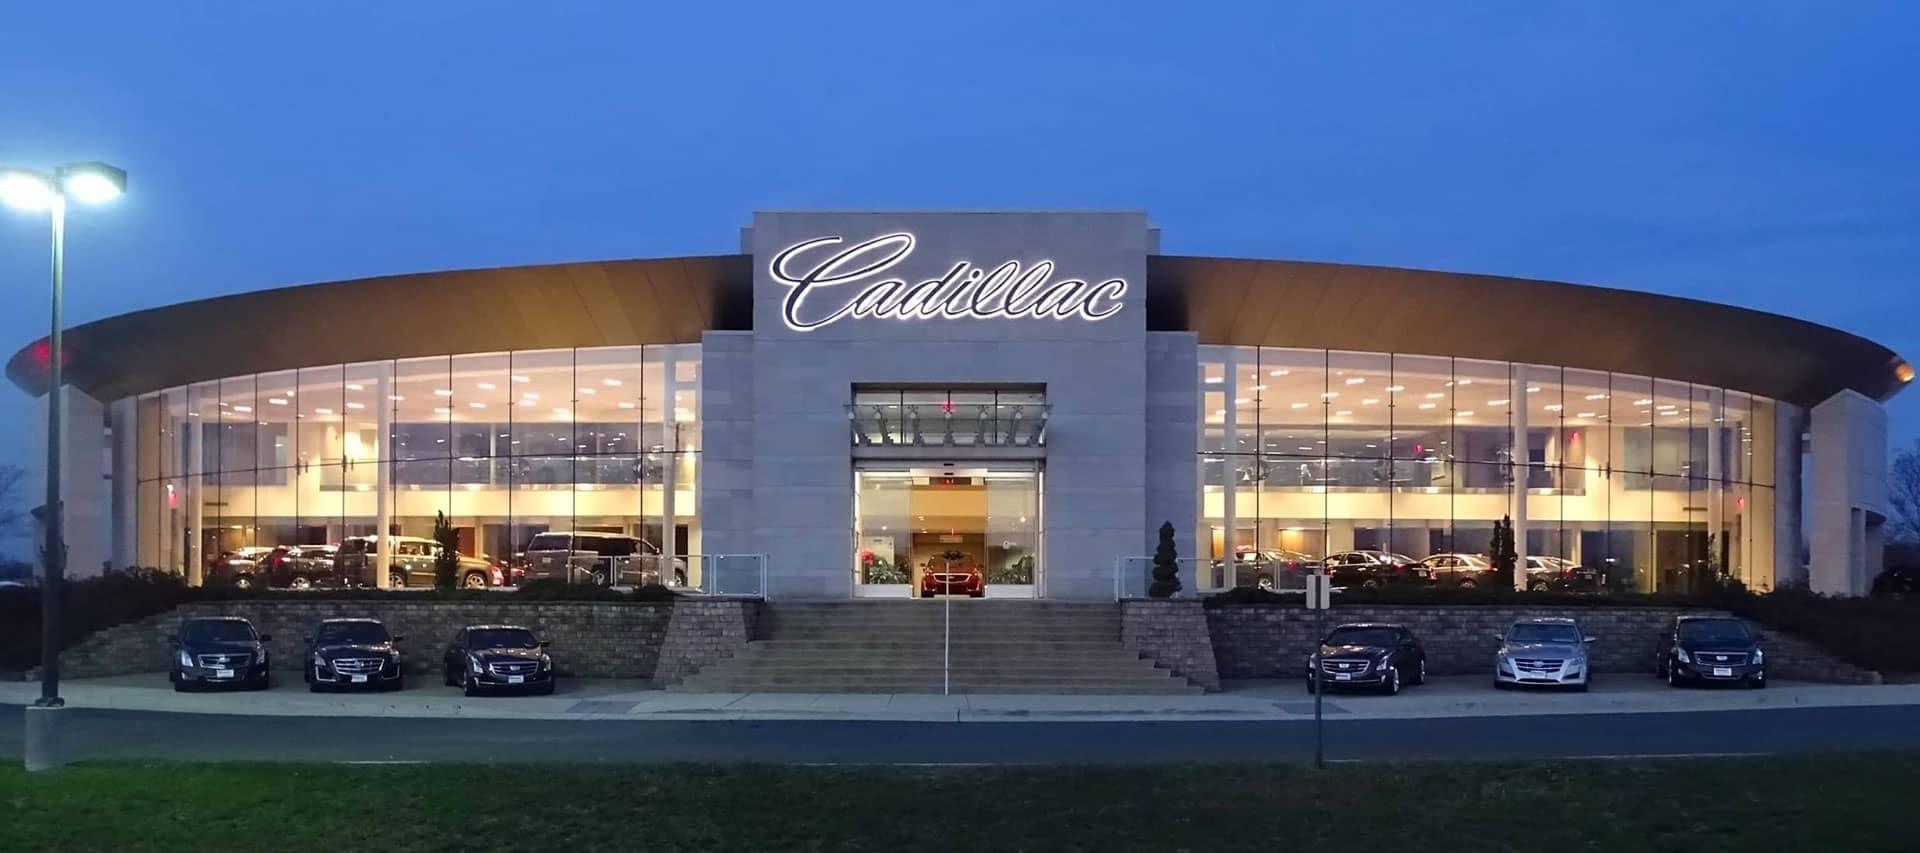 Moore Cadillac | Cadillac Dealer in Chantilly, VA